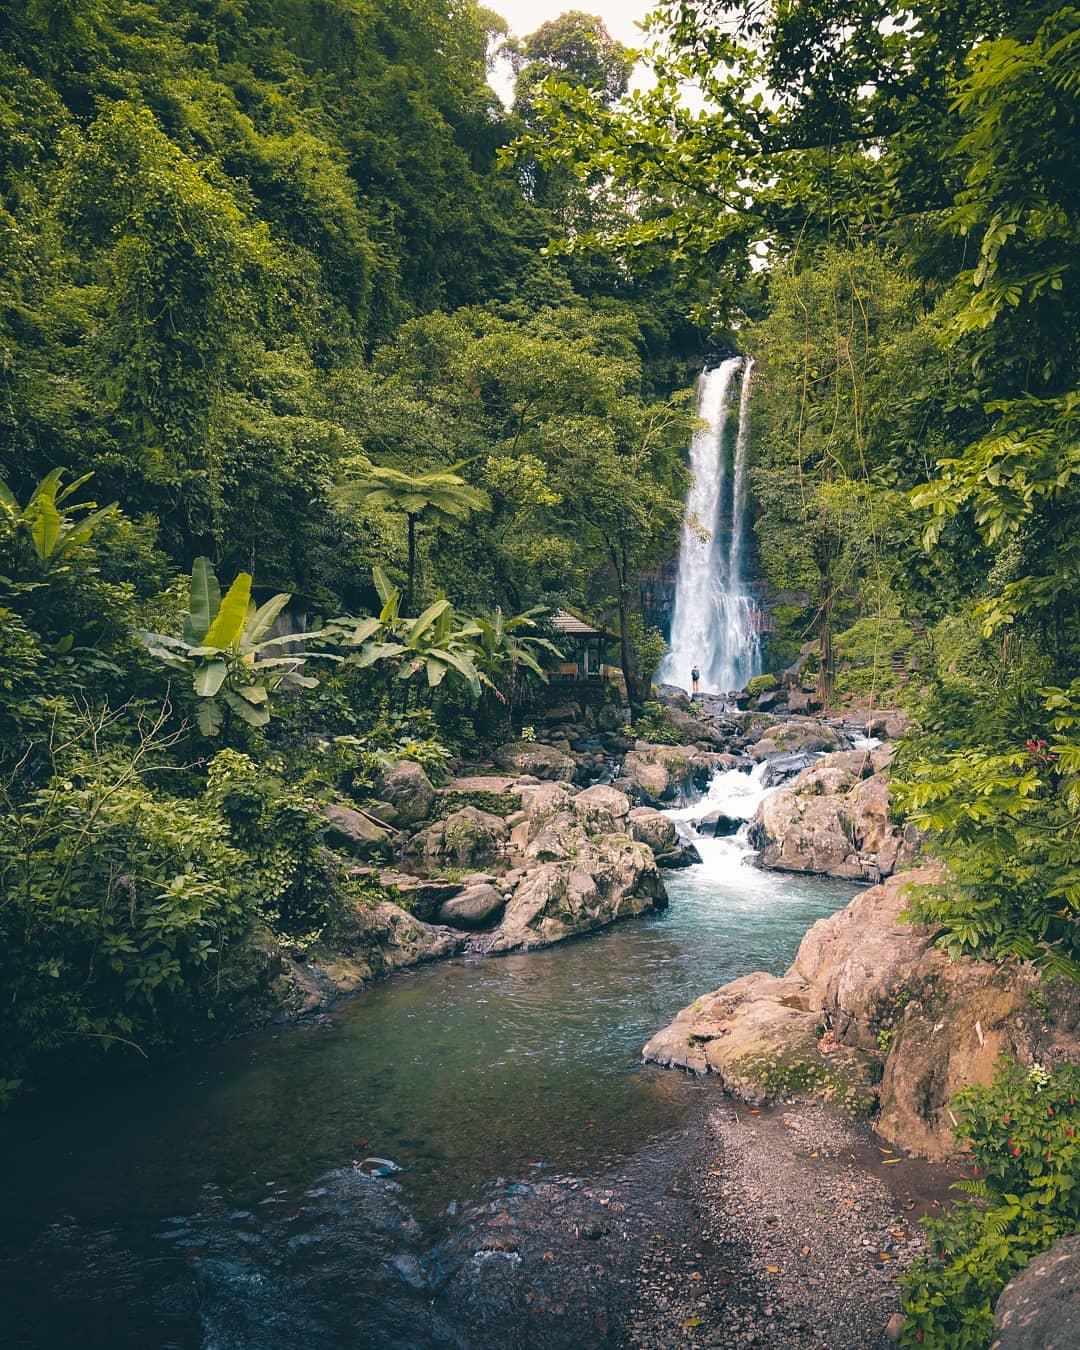 Gitgit Waterfall Singaraja Bali Tourist Guide!. via @frozenblizzard